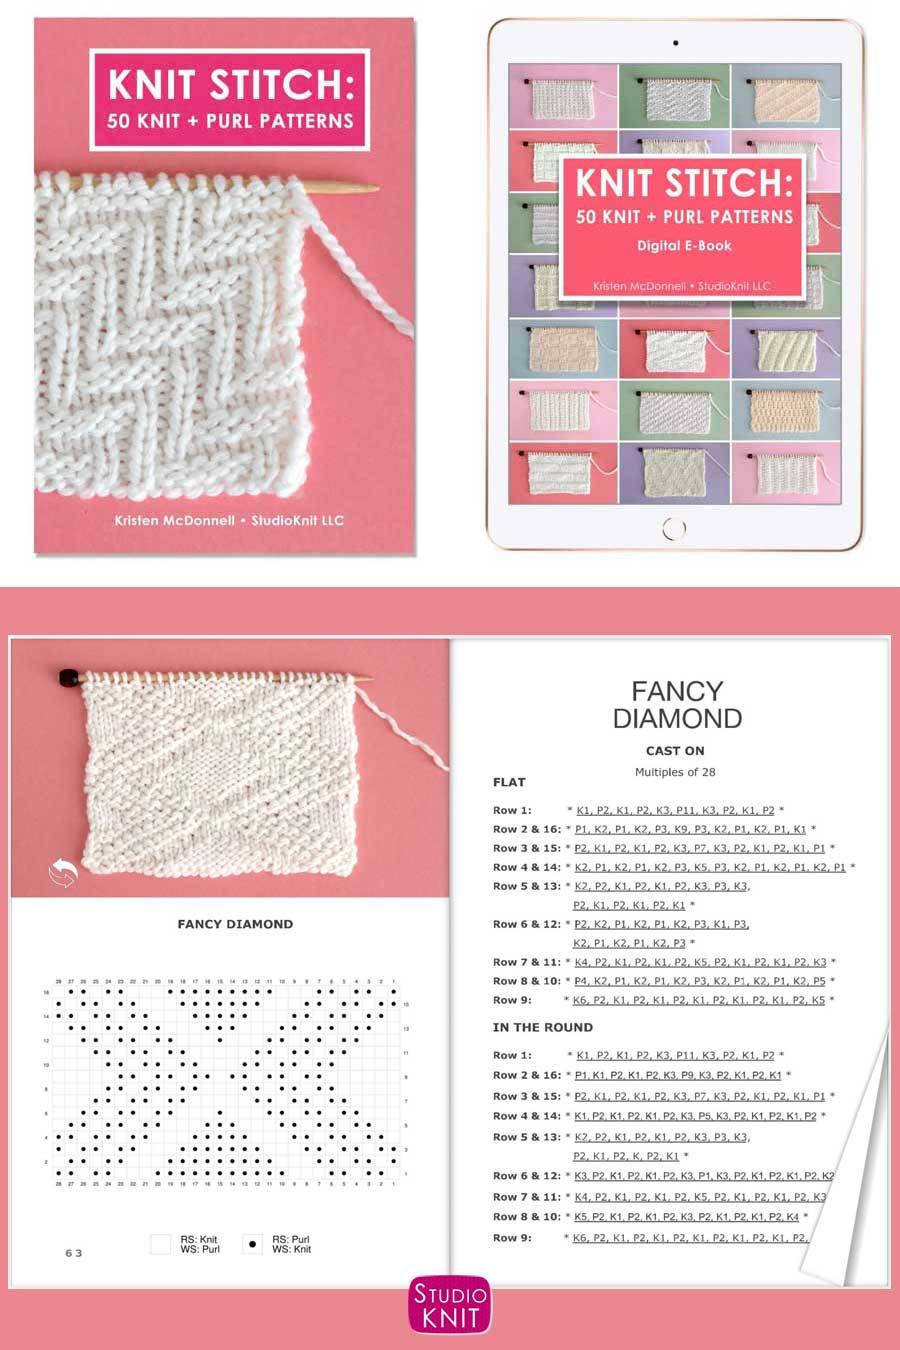 Knit Stitch Pattern Book with Fancy Diamond Stitch